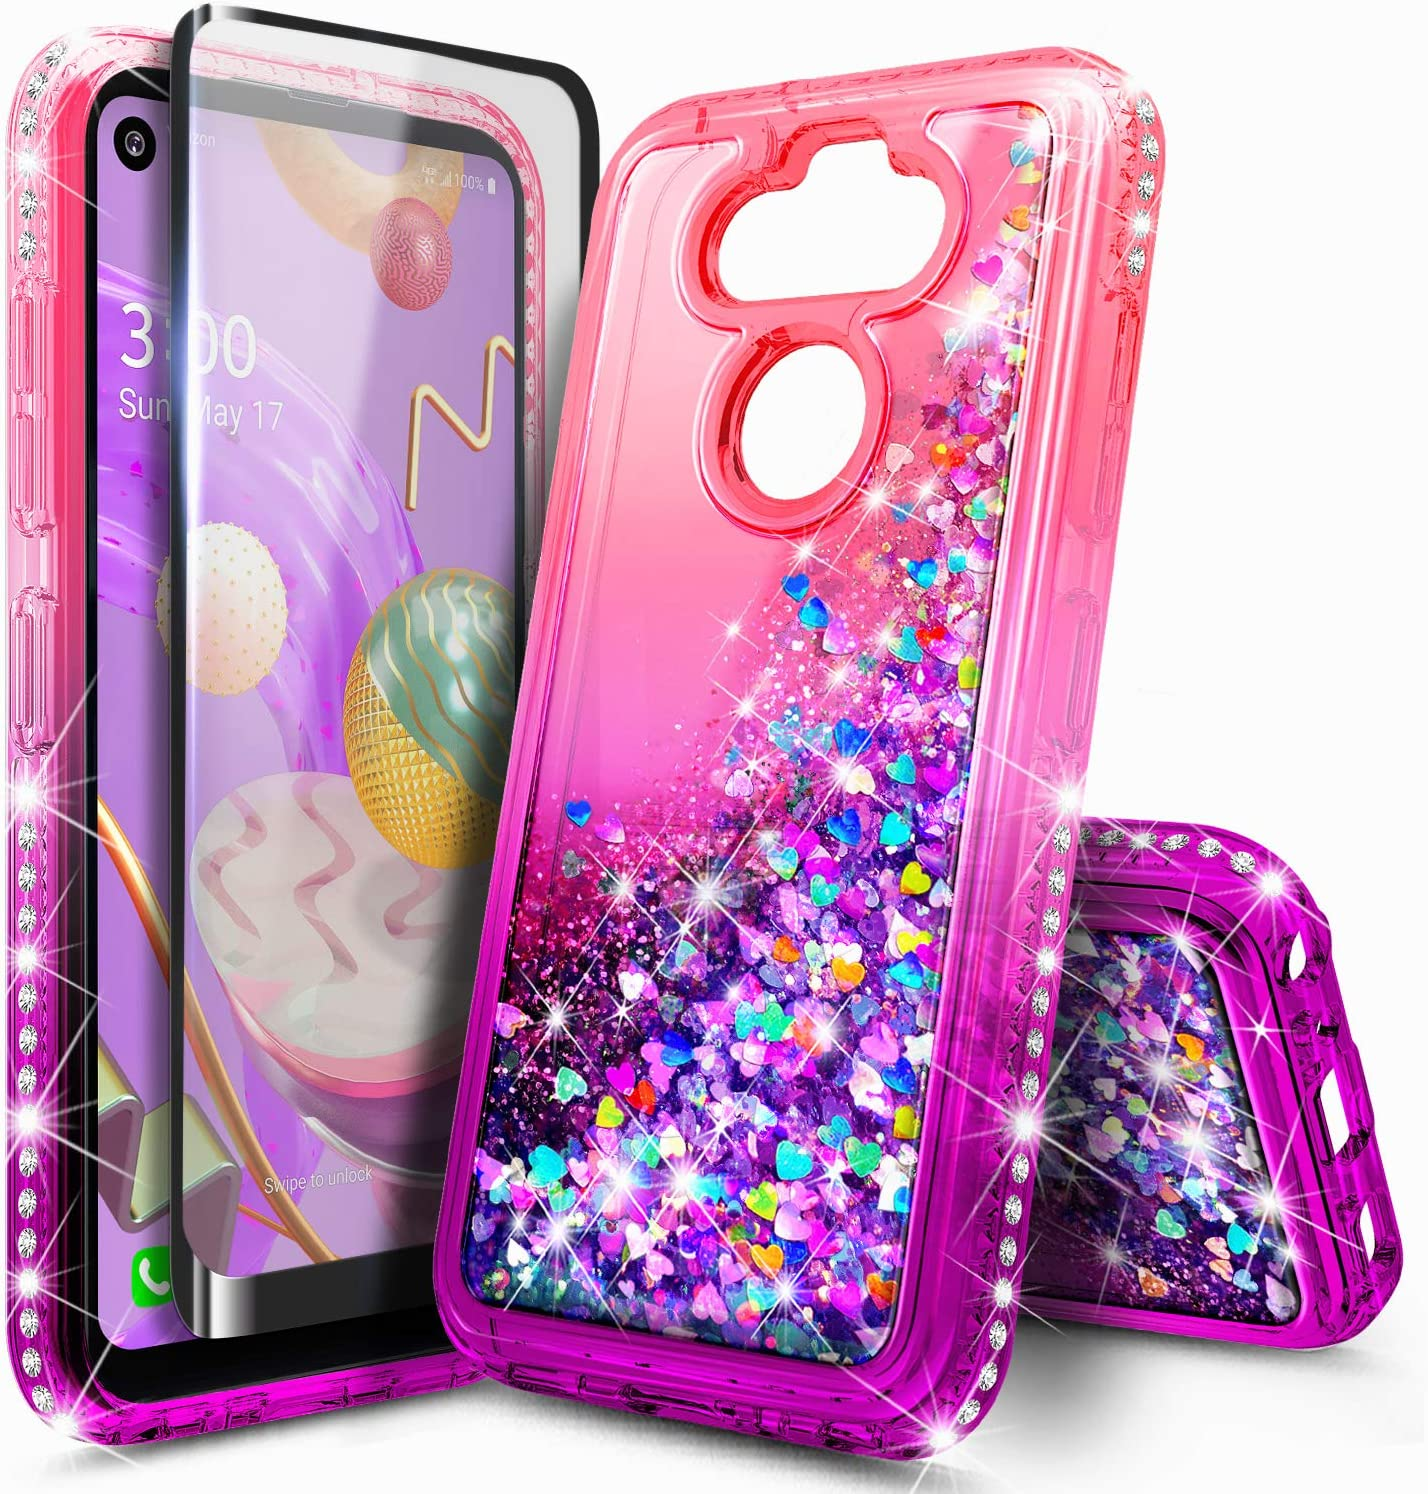 E-Began Case for LG Phoenix 5, K31 Rebel (L355DL) with Tempered Glass Screen Protector, Glitter Liquid Girls Cute Phone Case for LG Aristo 5/K31/Tribute Monarch/LG K8X/Fortune 3/Risio 4 -Pink/Purple